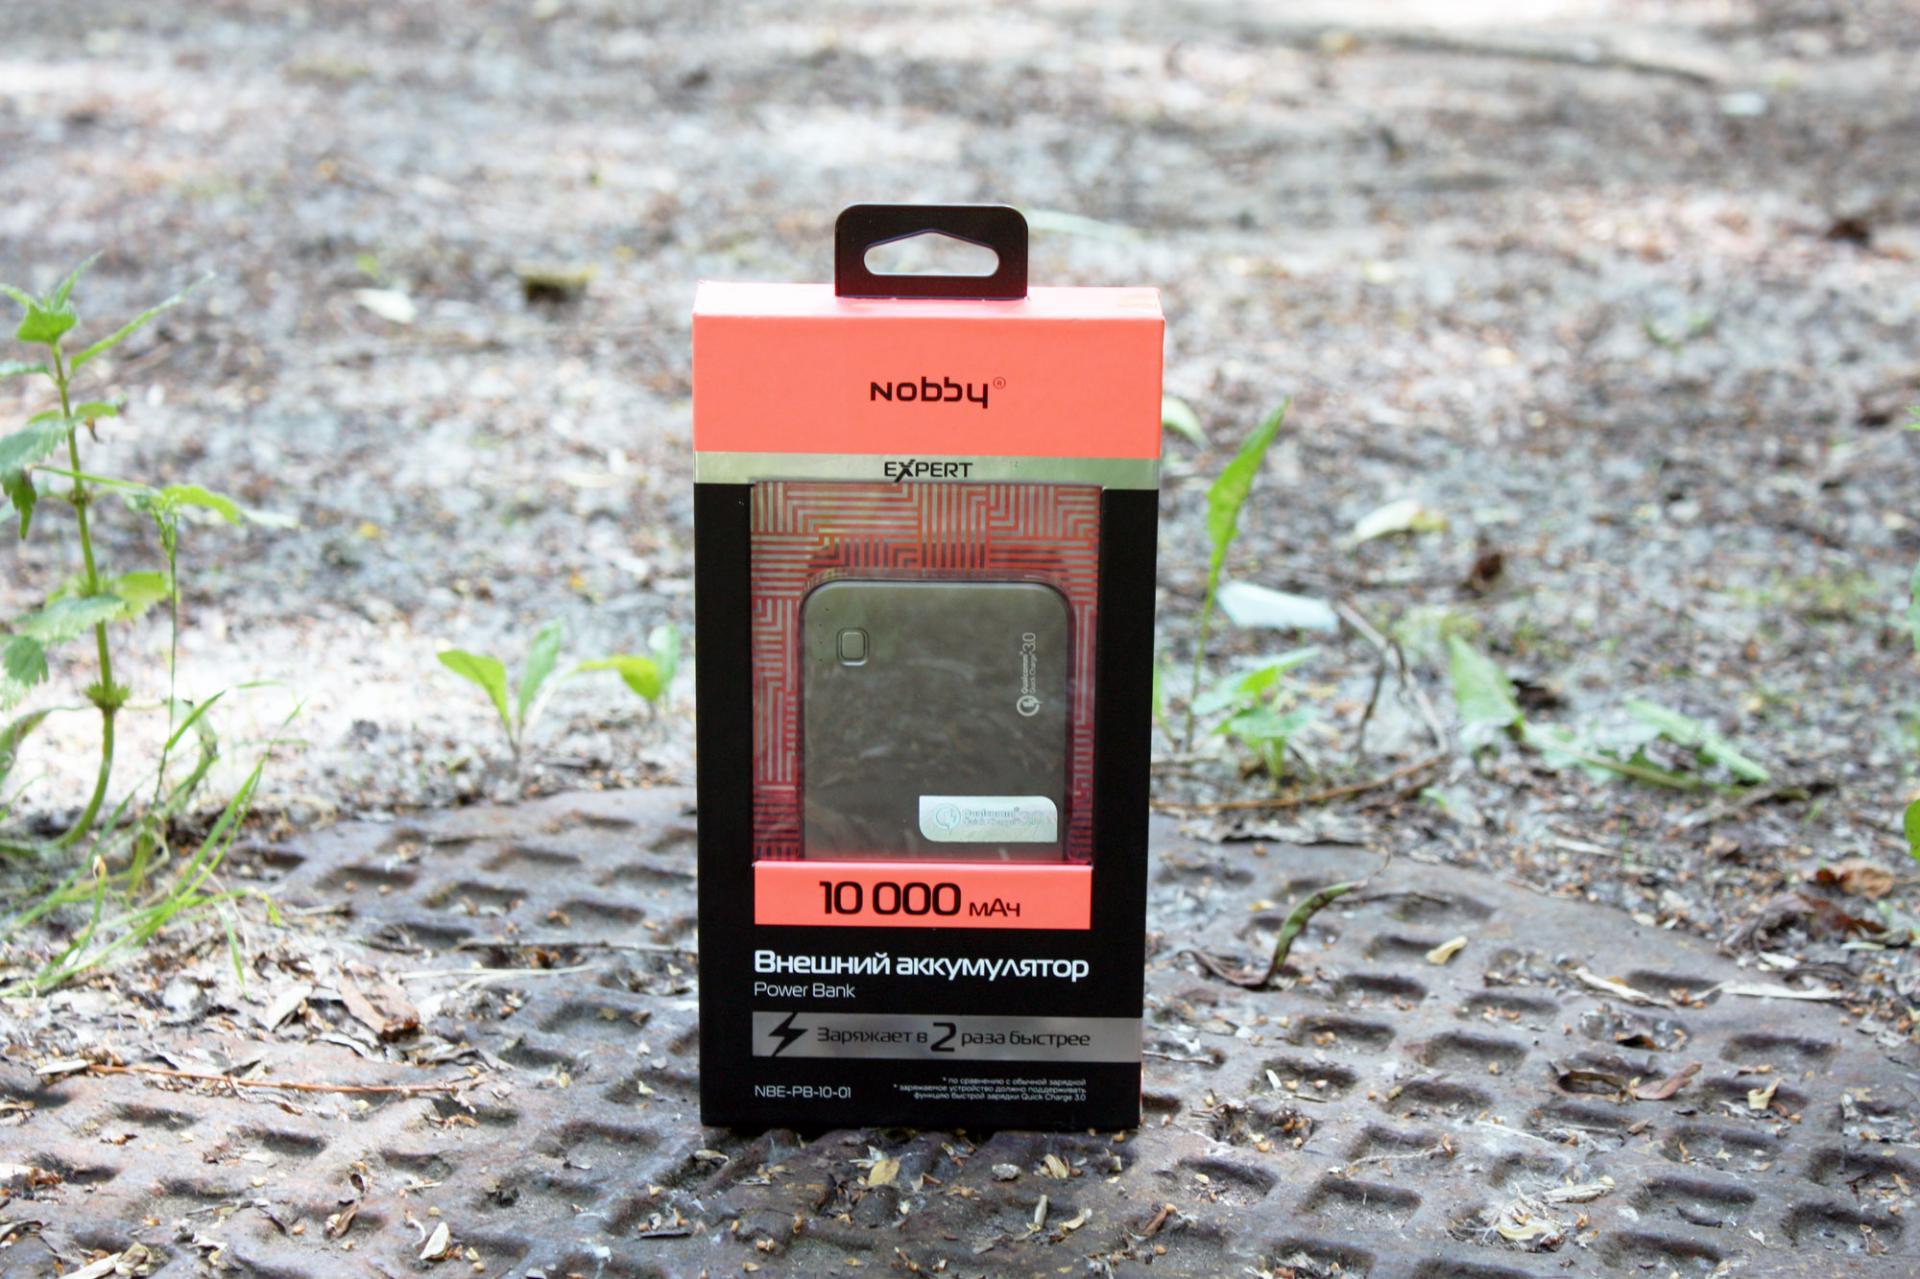 Обзор внешнего аккумулятора Nobby Power Bank Expert (NBE-PB-10-01)